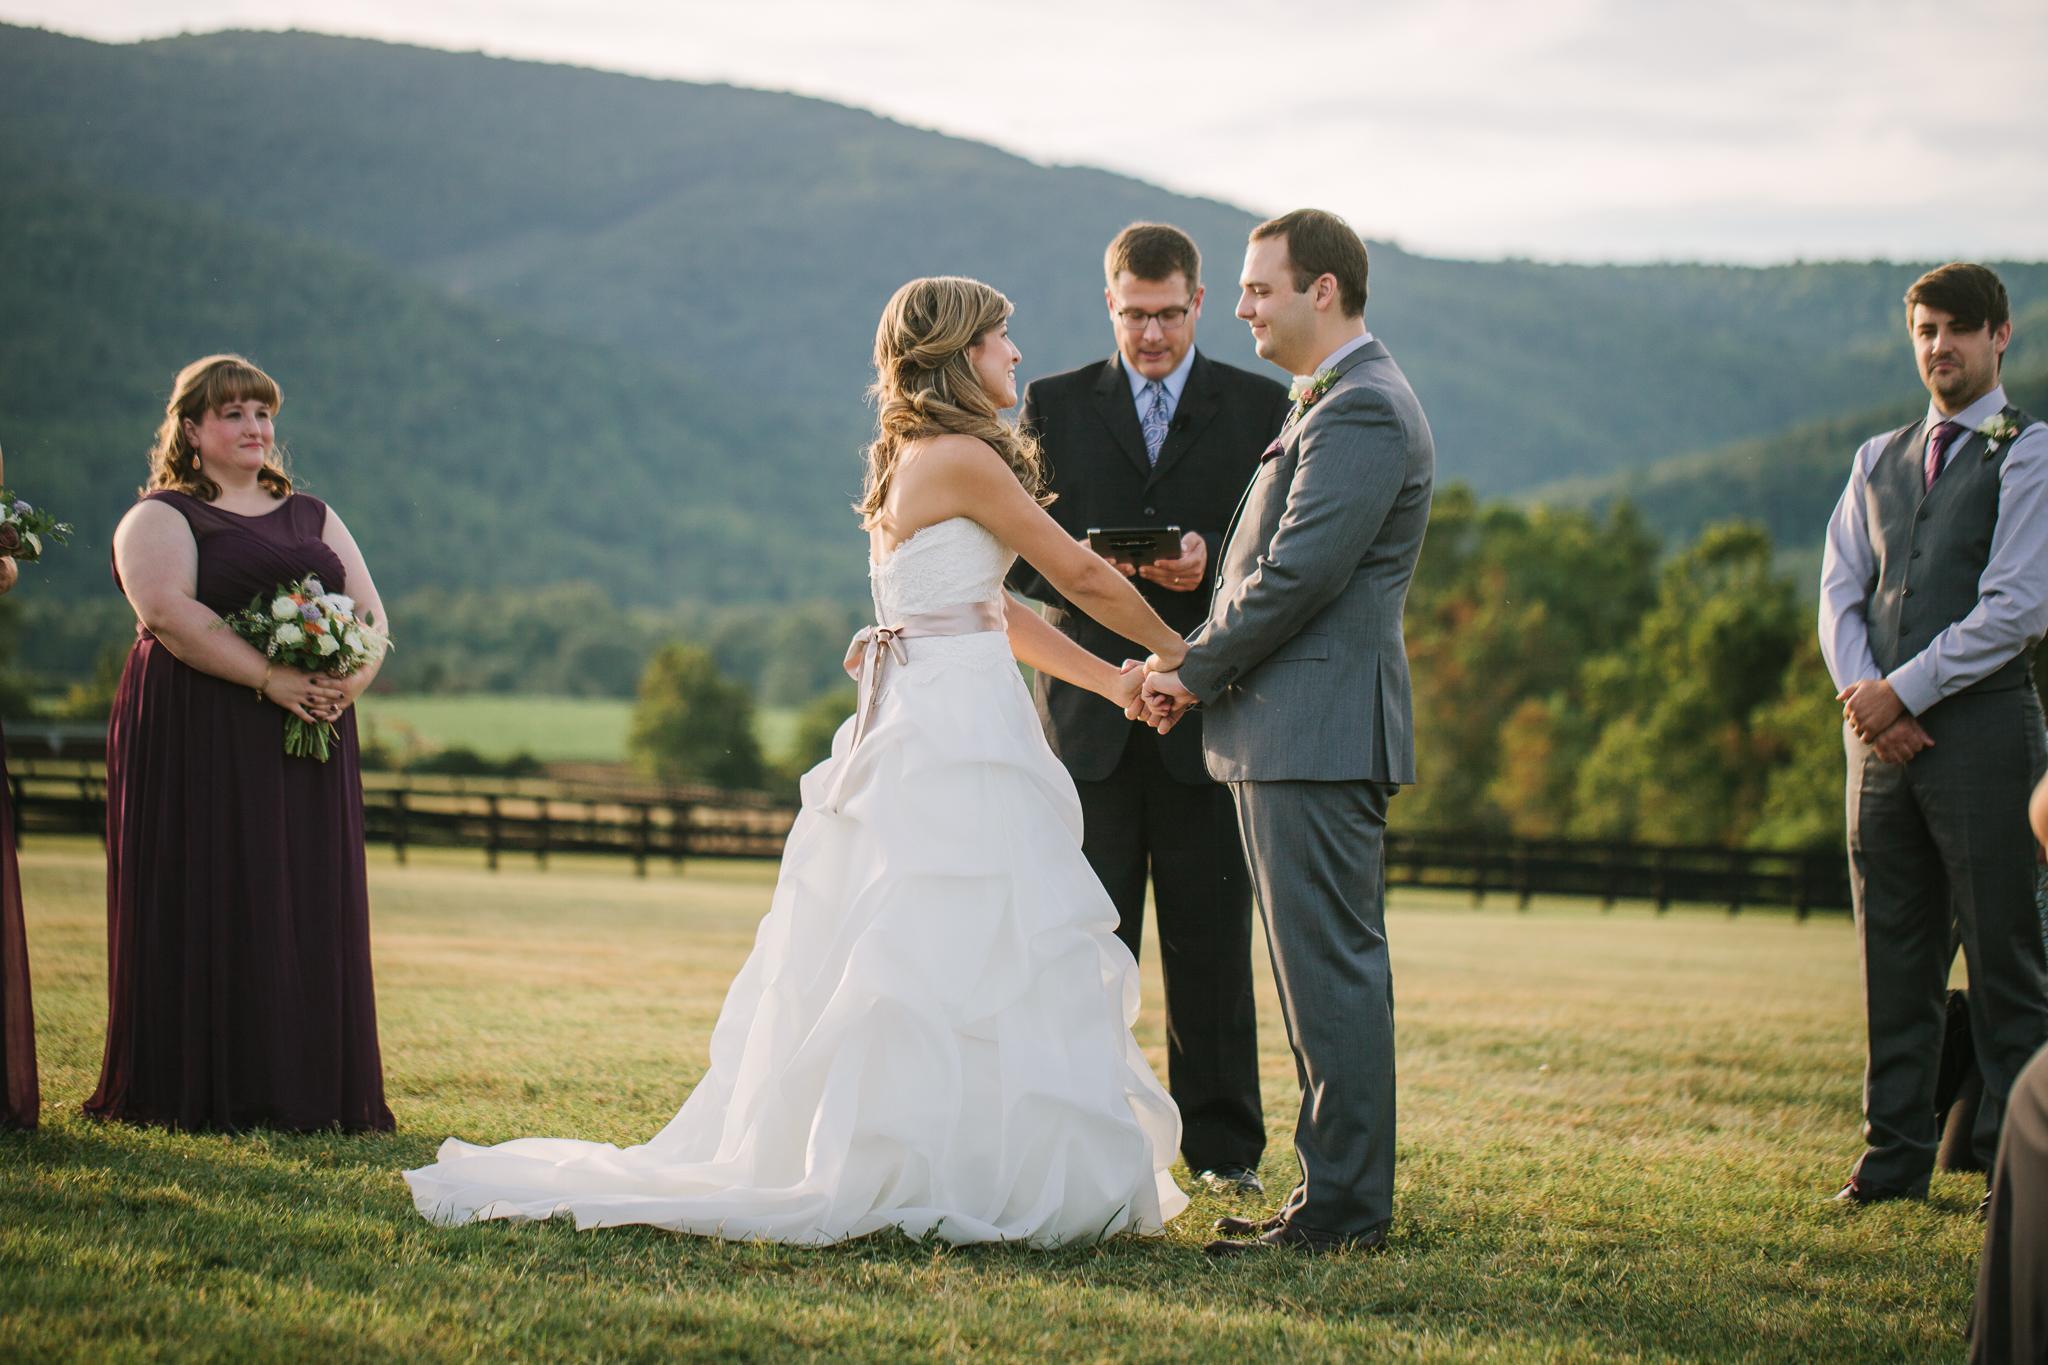 King-family-wedding-photos_30.jpg